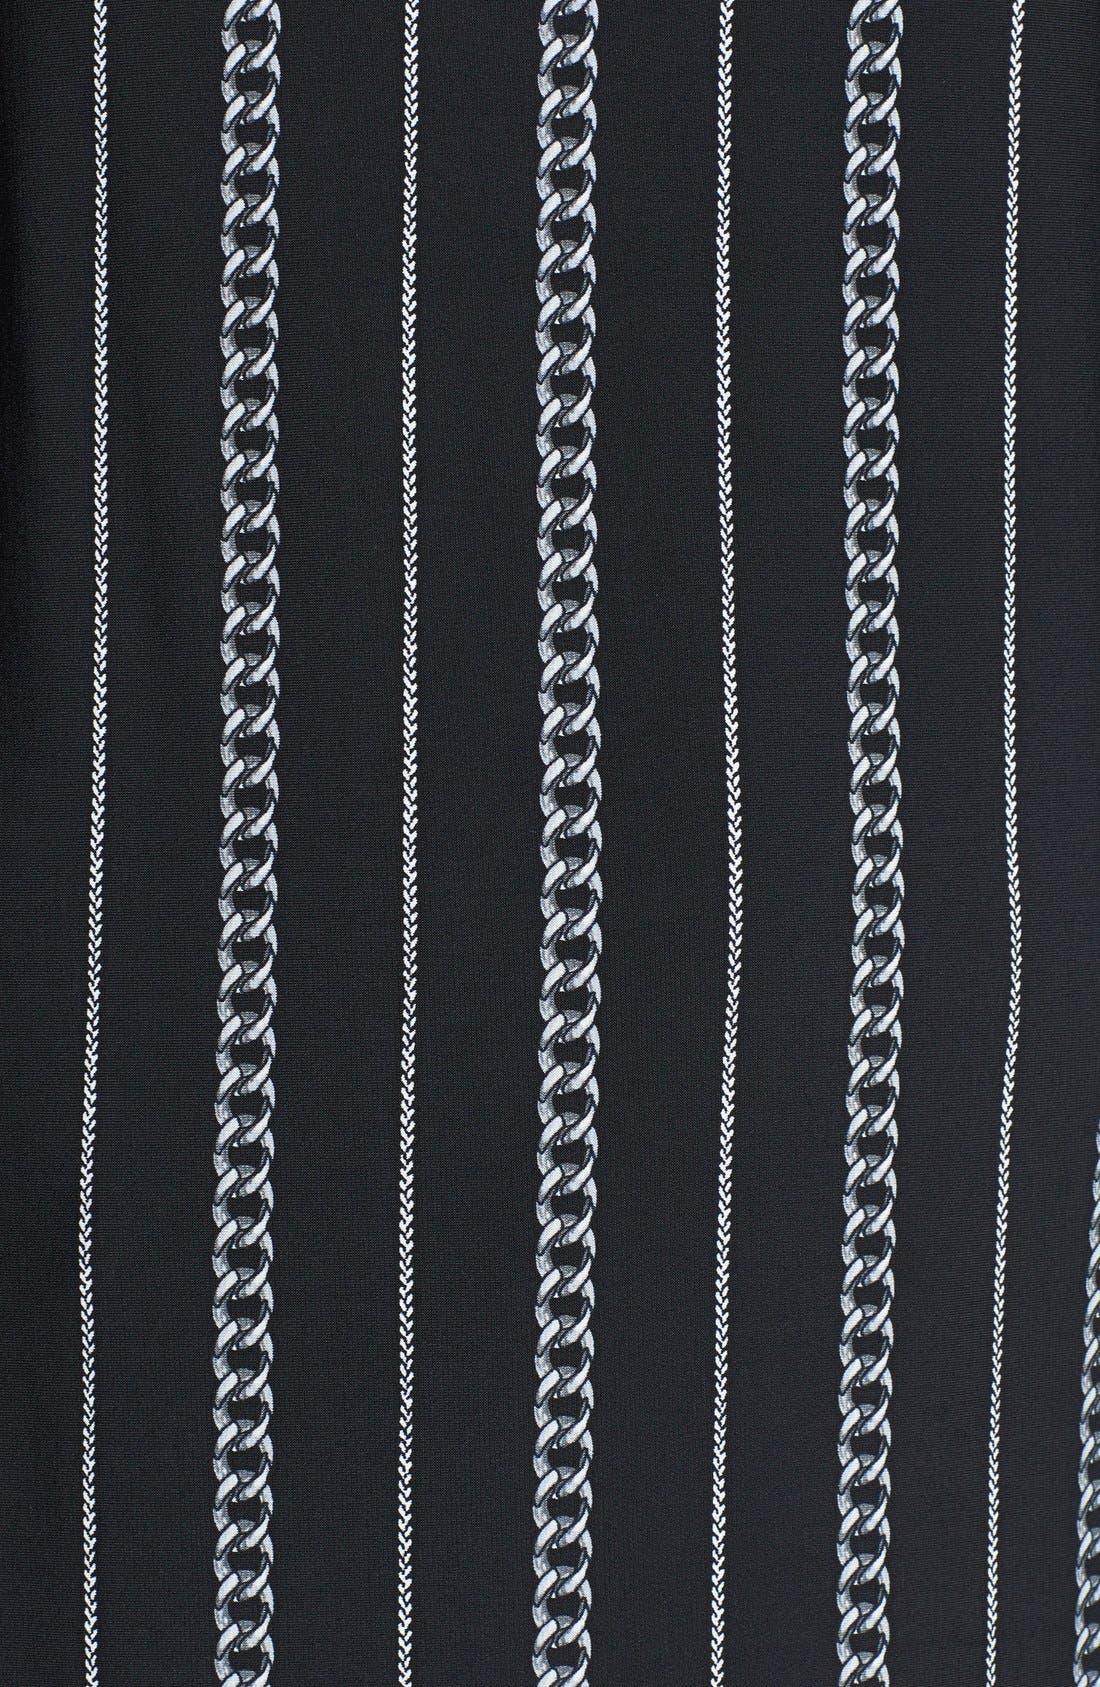 Alternate Image 3  - MICHAEL Michael Kors Chain Fringe Tie Print Top